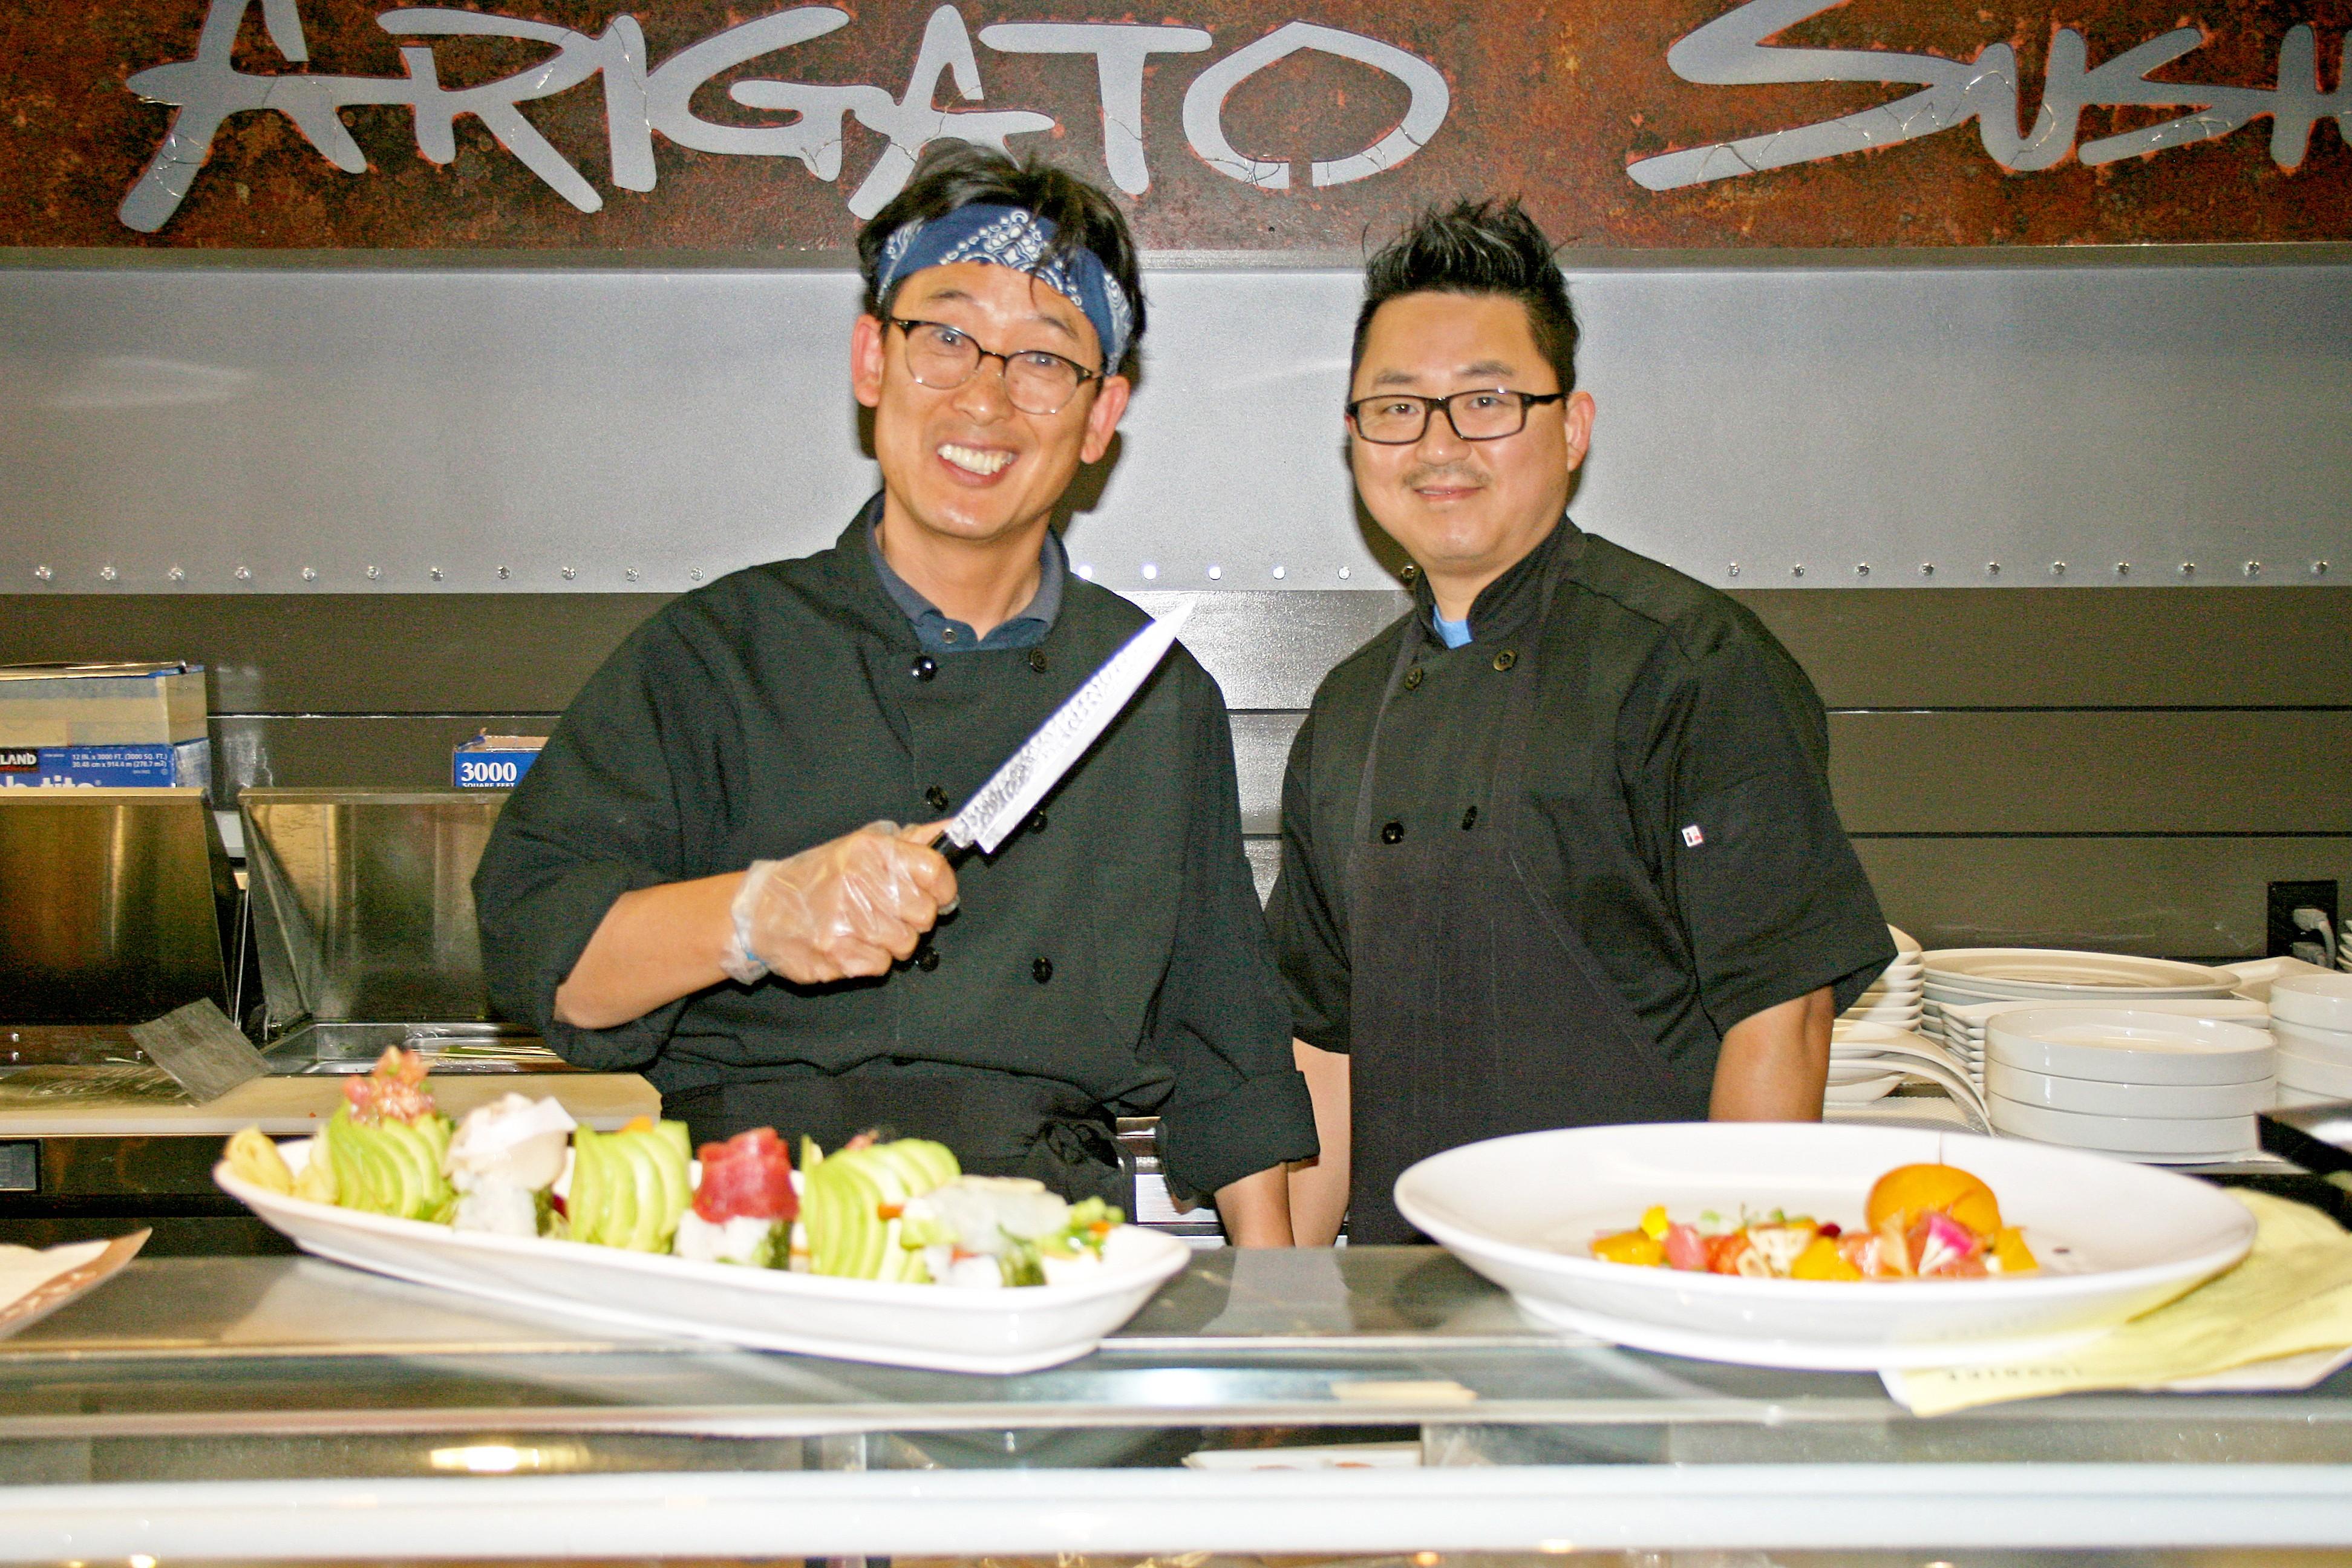 Sashimi, steak make a splash at Arigato Sushi | Flavor | San Luis